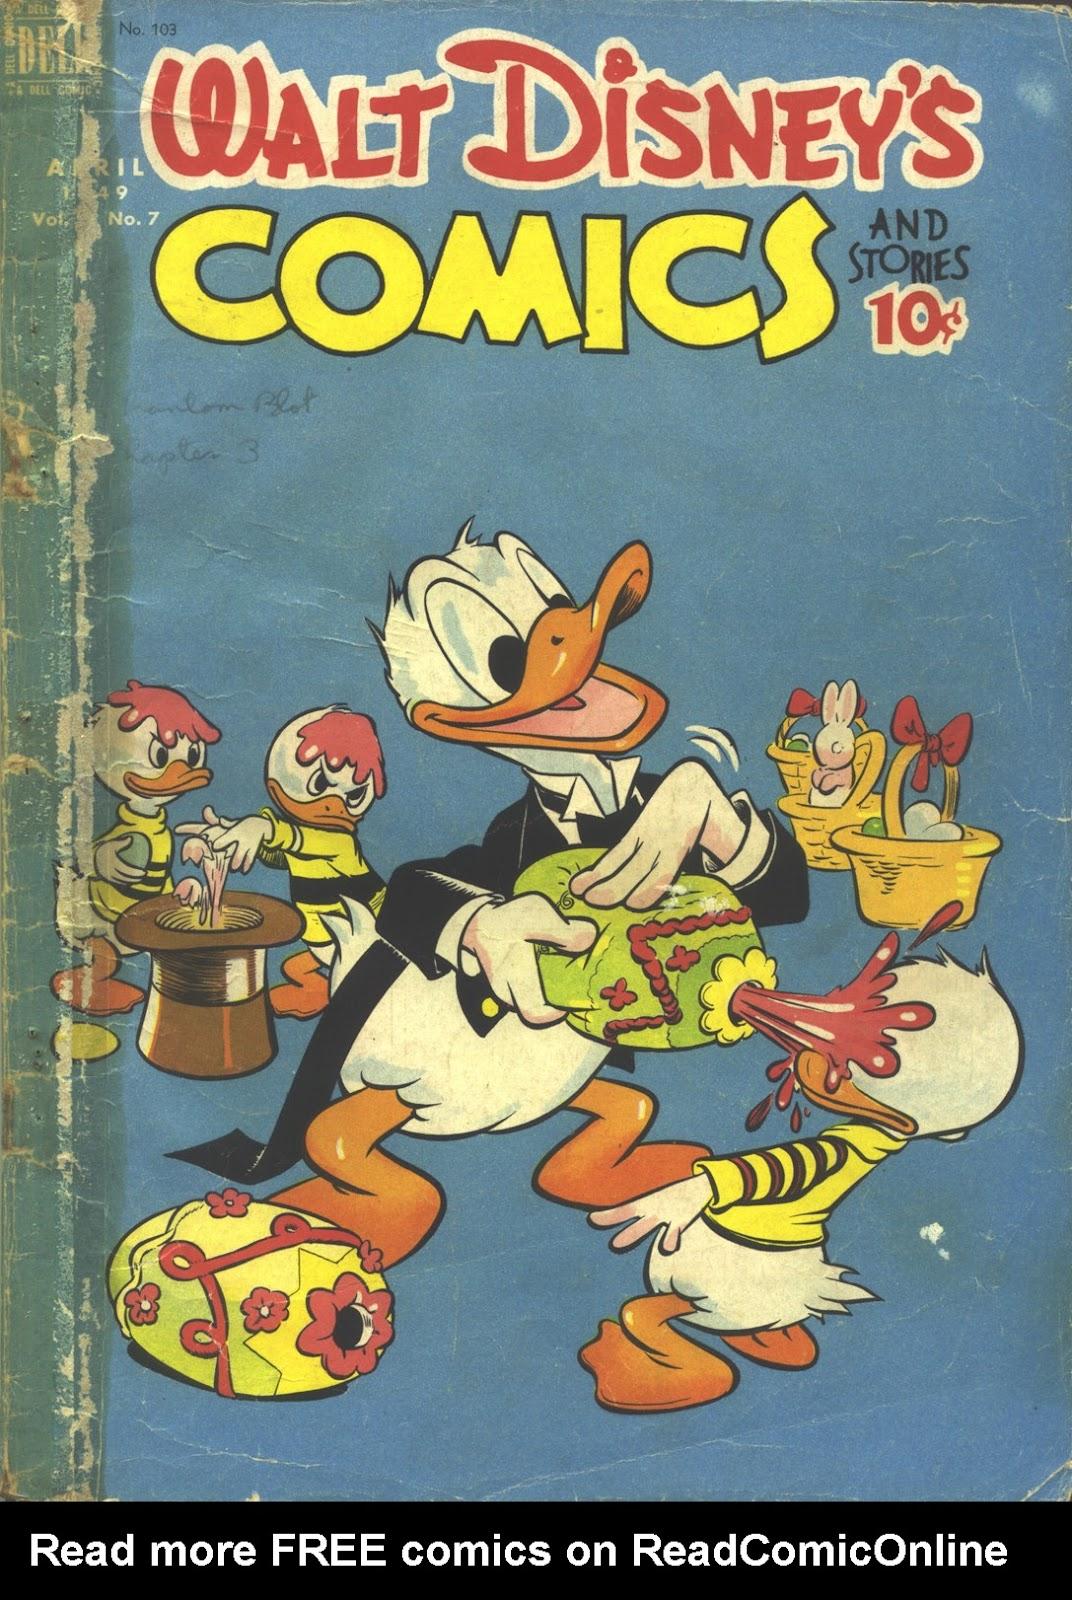 Walt Disneys Comics and Stories 103 Page 1